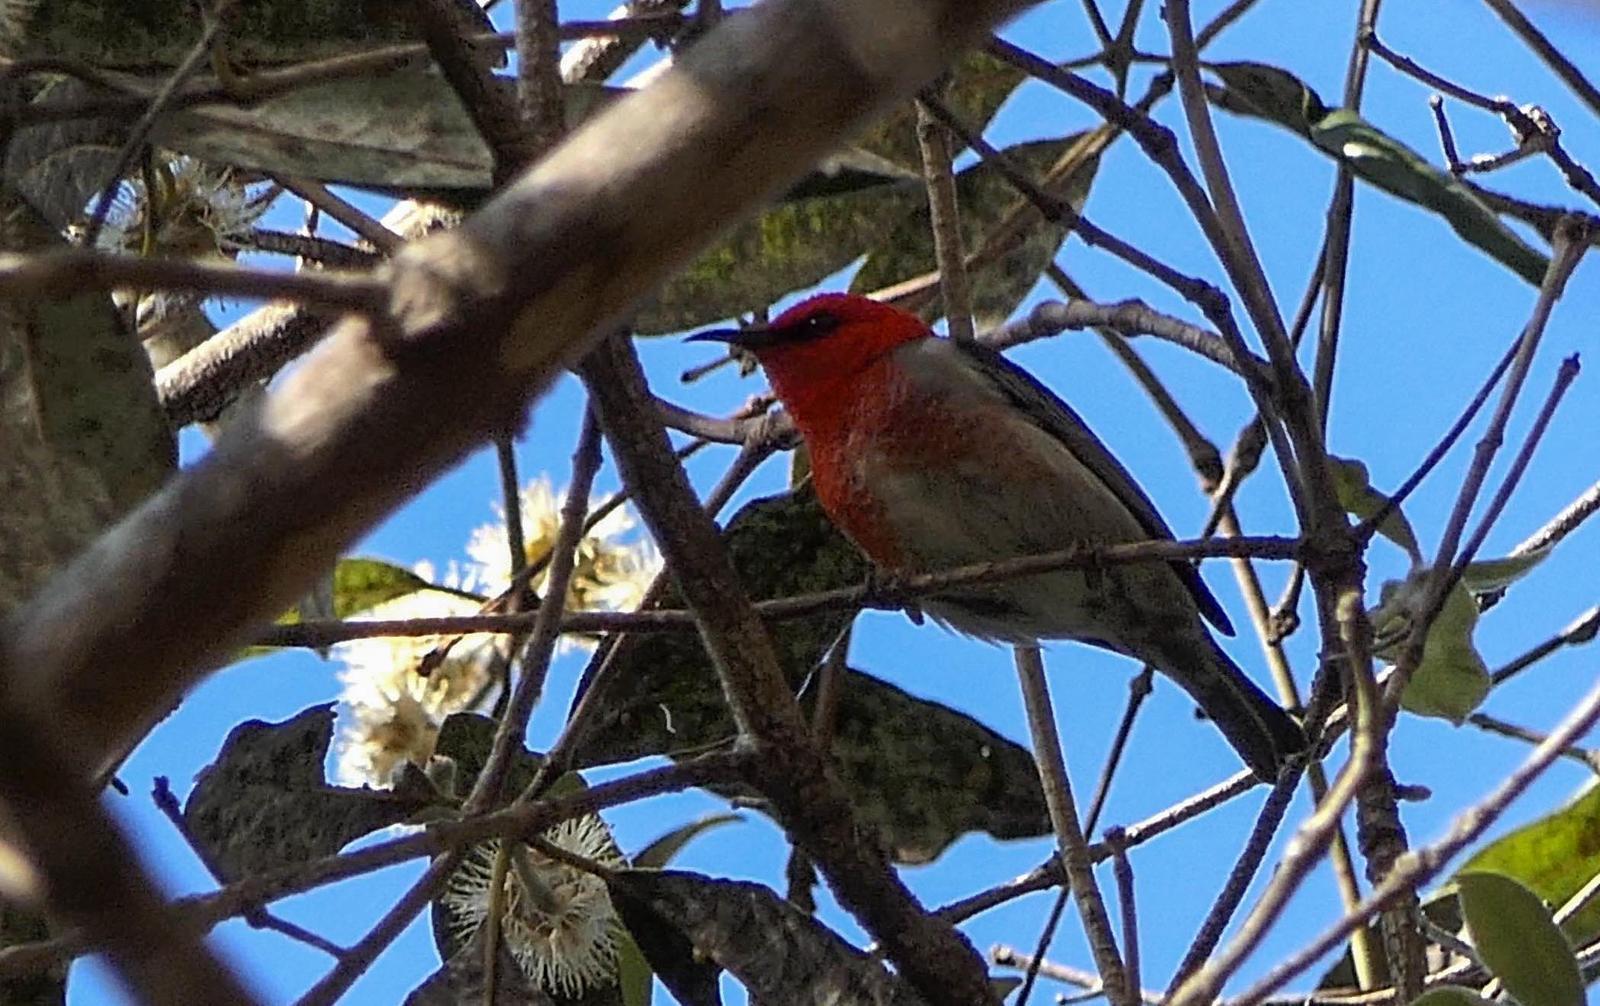 Scarlet Myzomela Photo by Randy Siebert